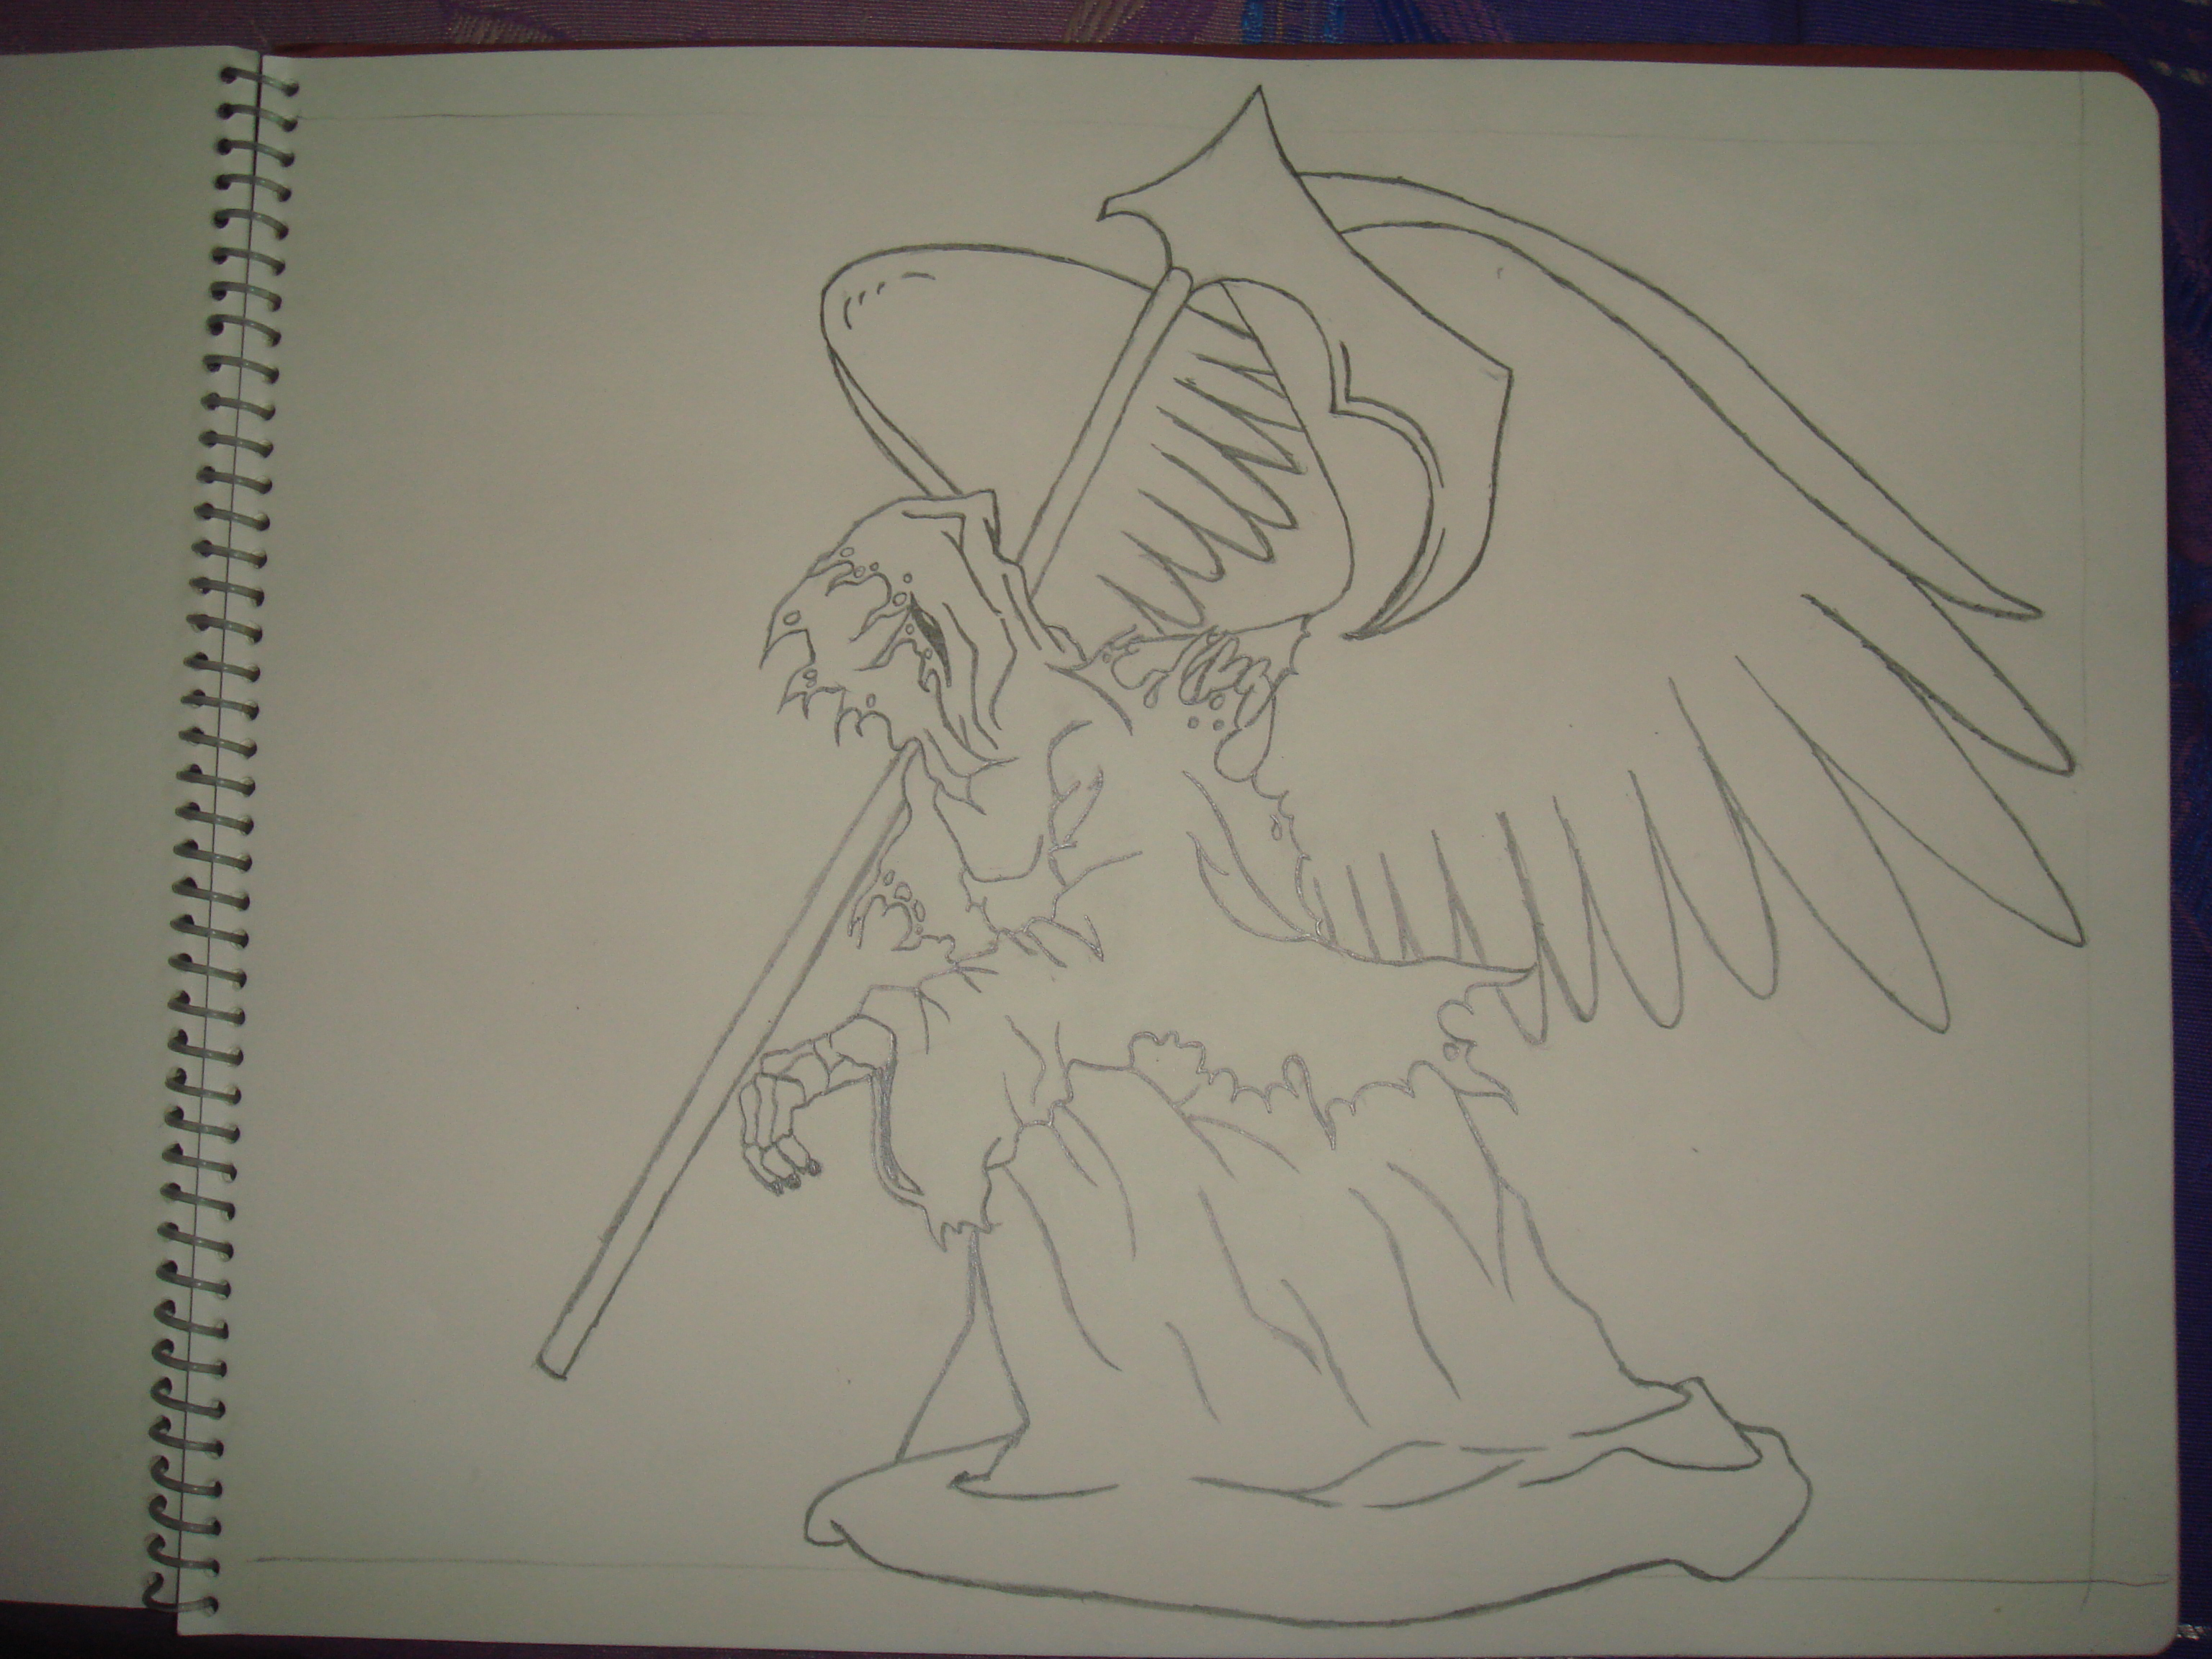 Drawn grim reaper graffiti 30 2017 Drawing Drawing Reaper